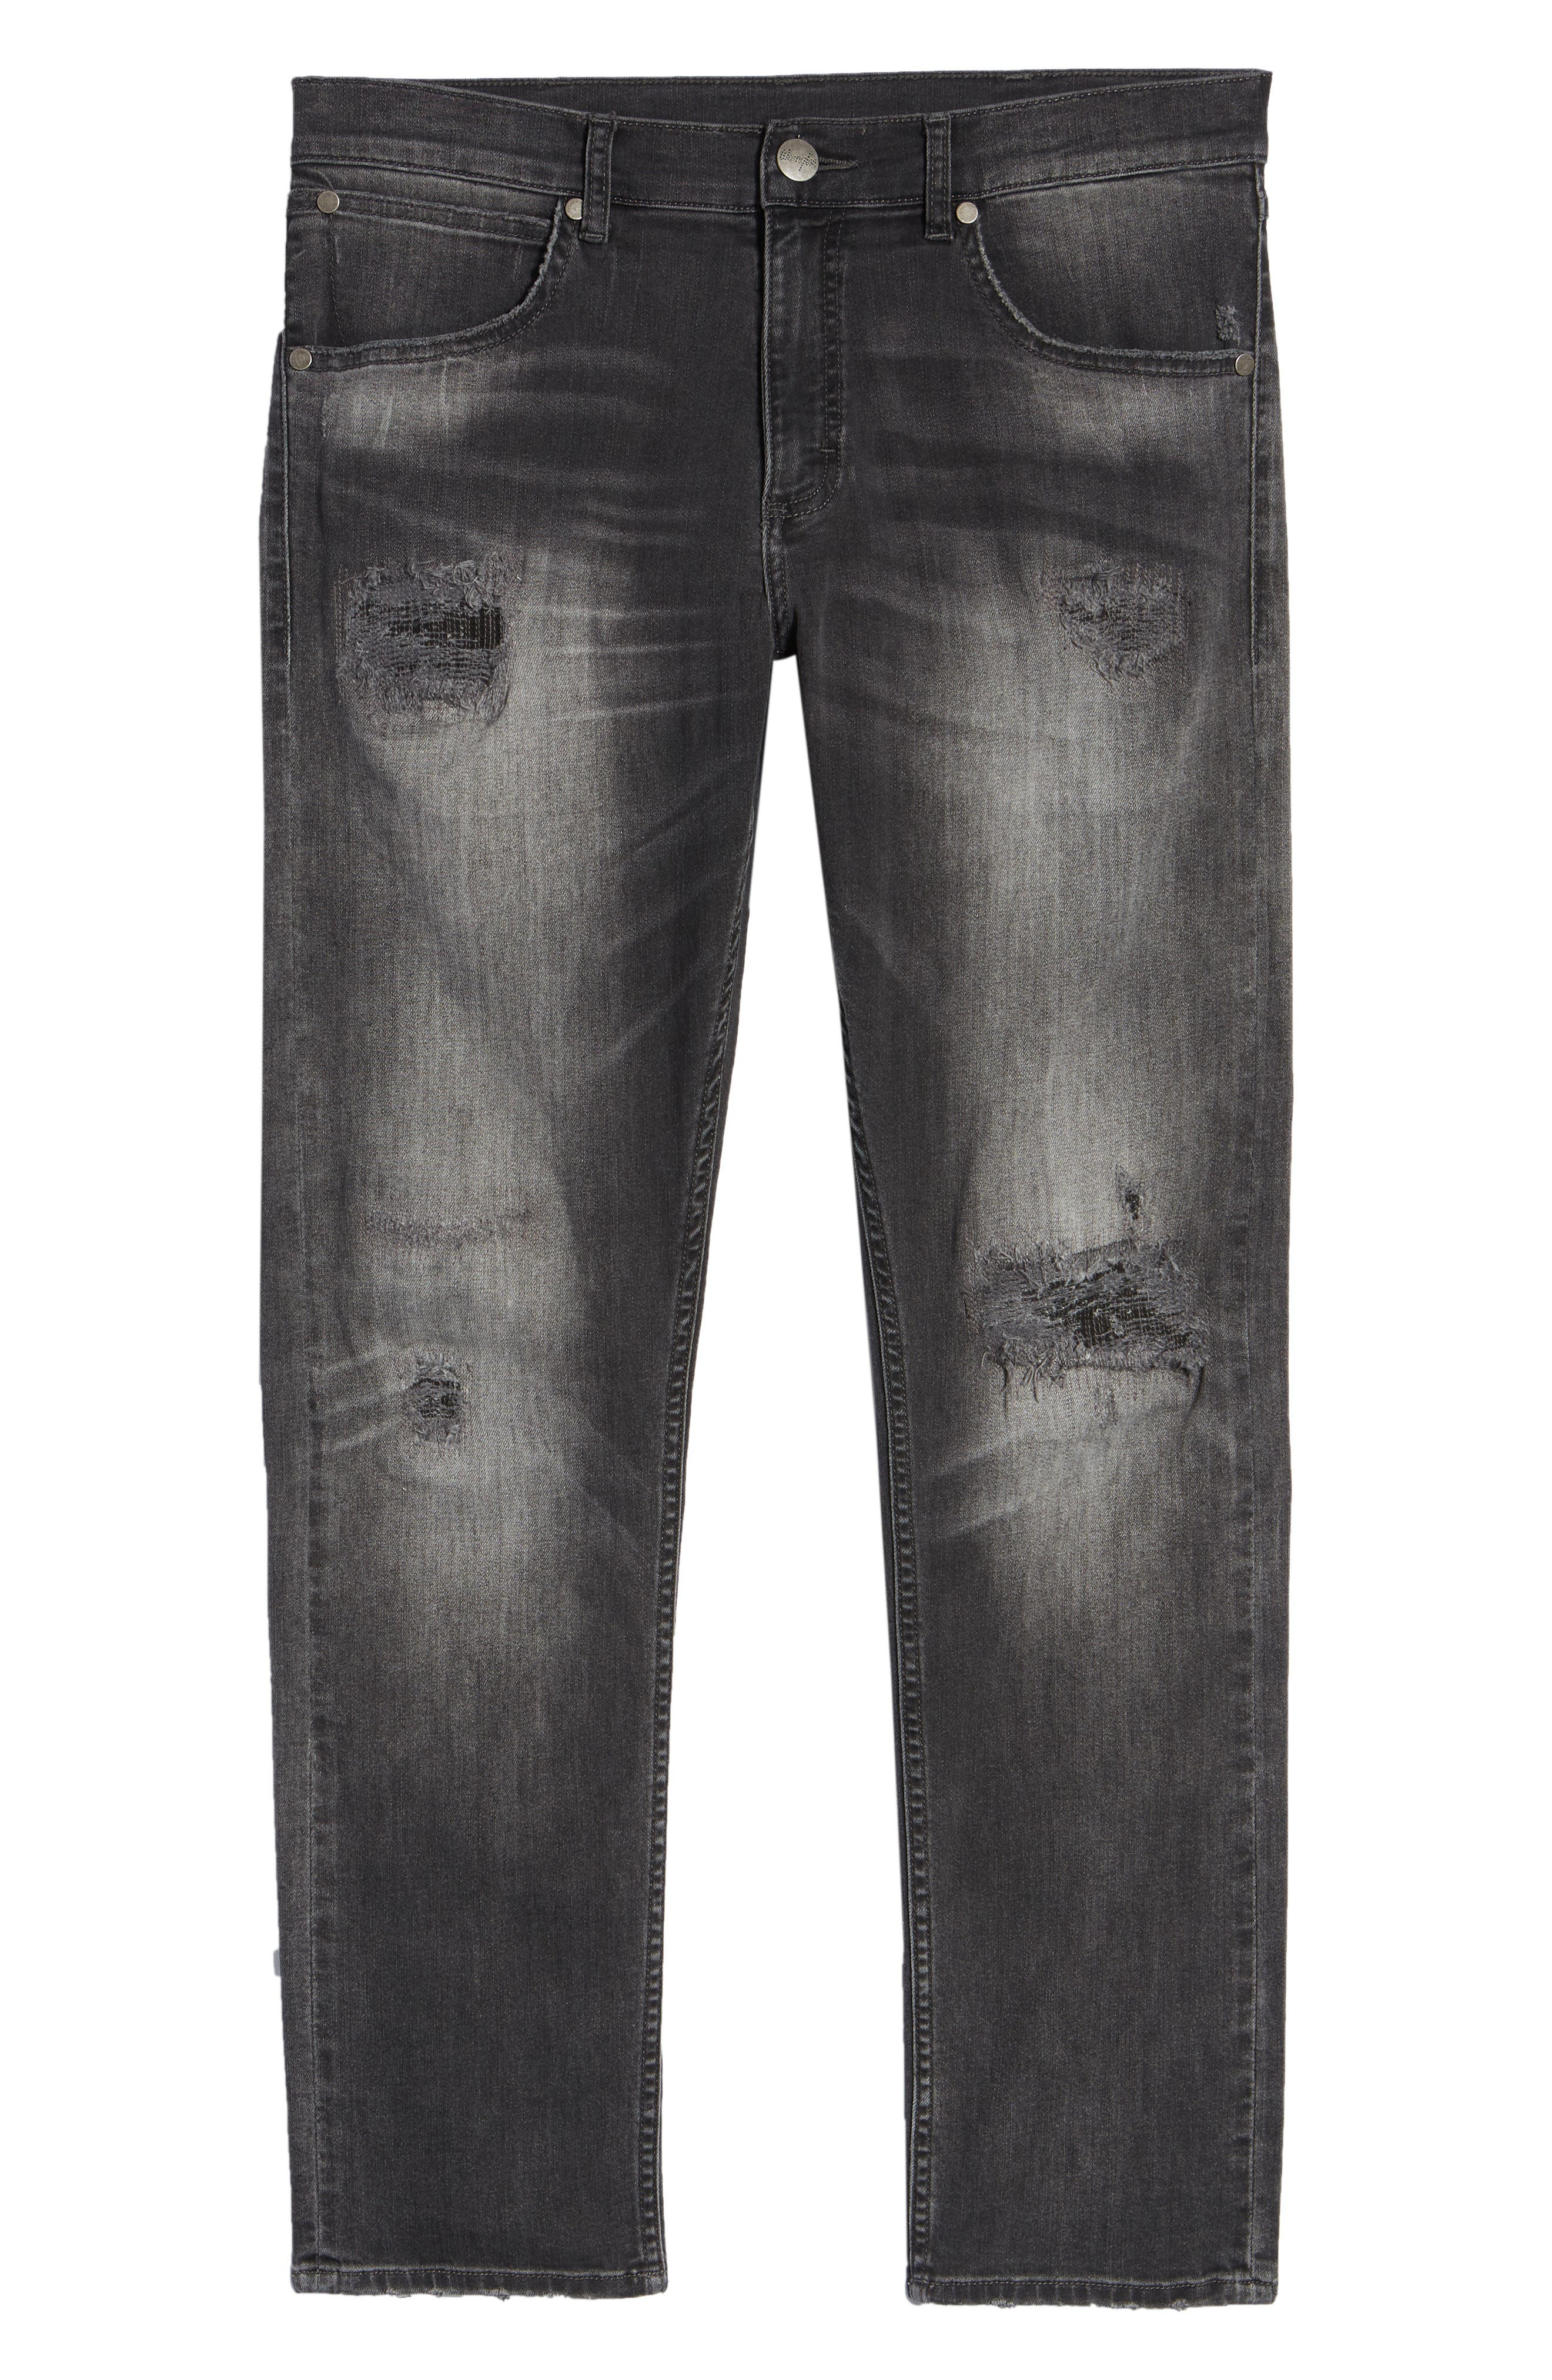 Greensboro Straight Leg Jeans,                             Alternate thumbnail 6, color,                             GREY DESTRUCT